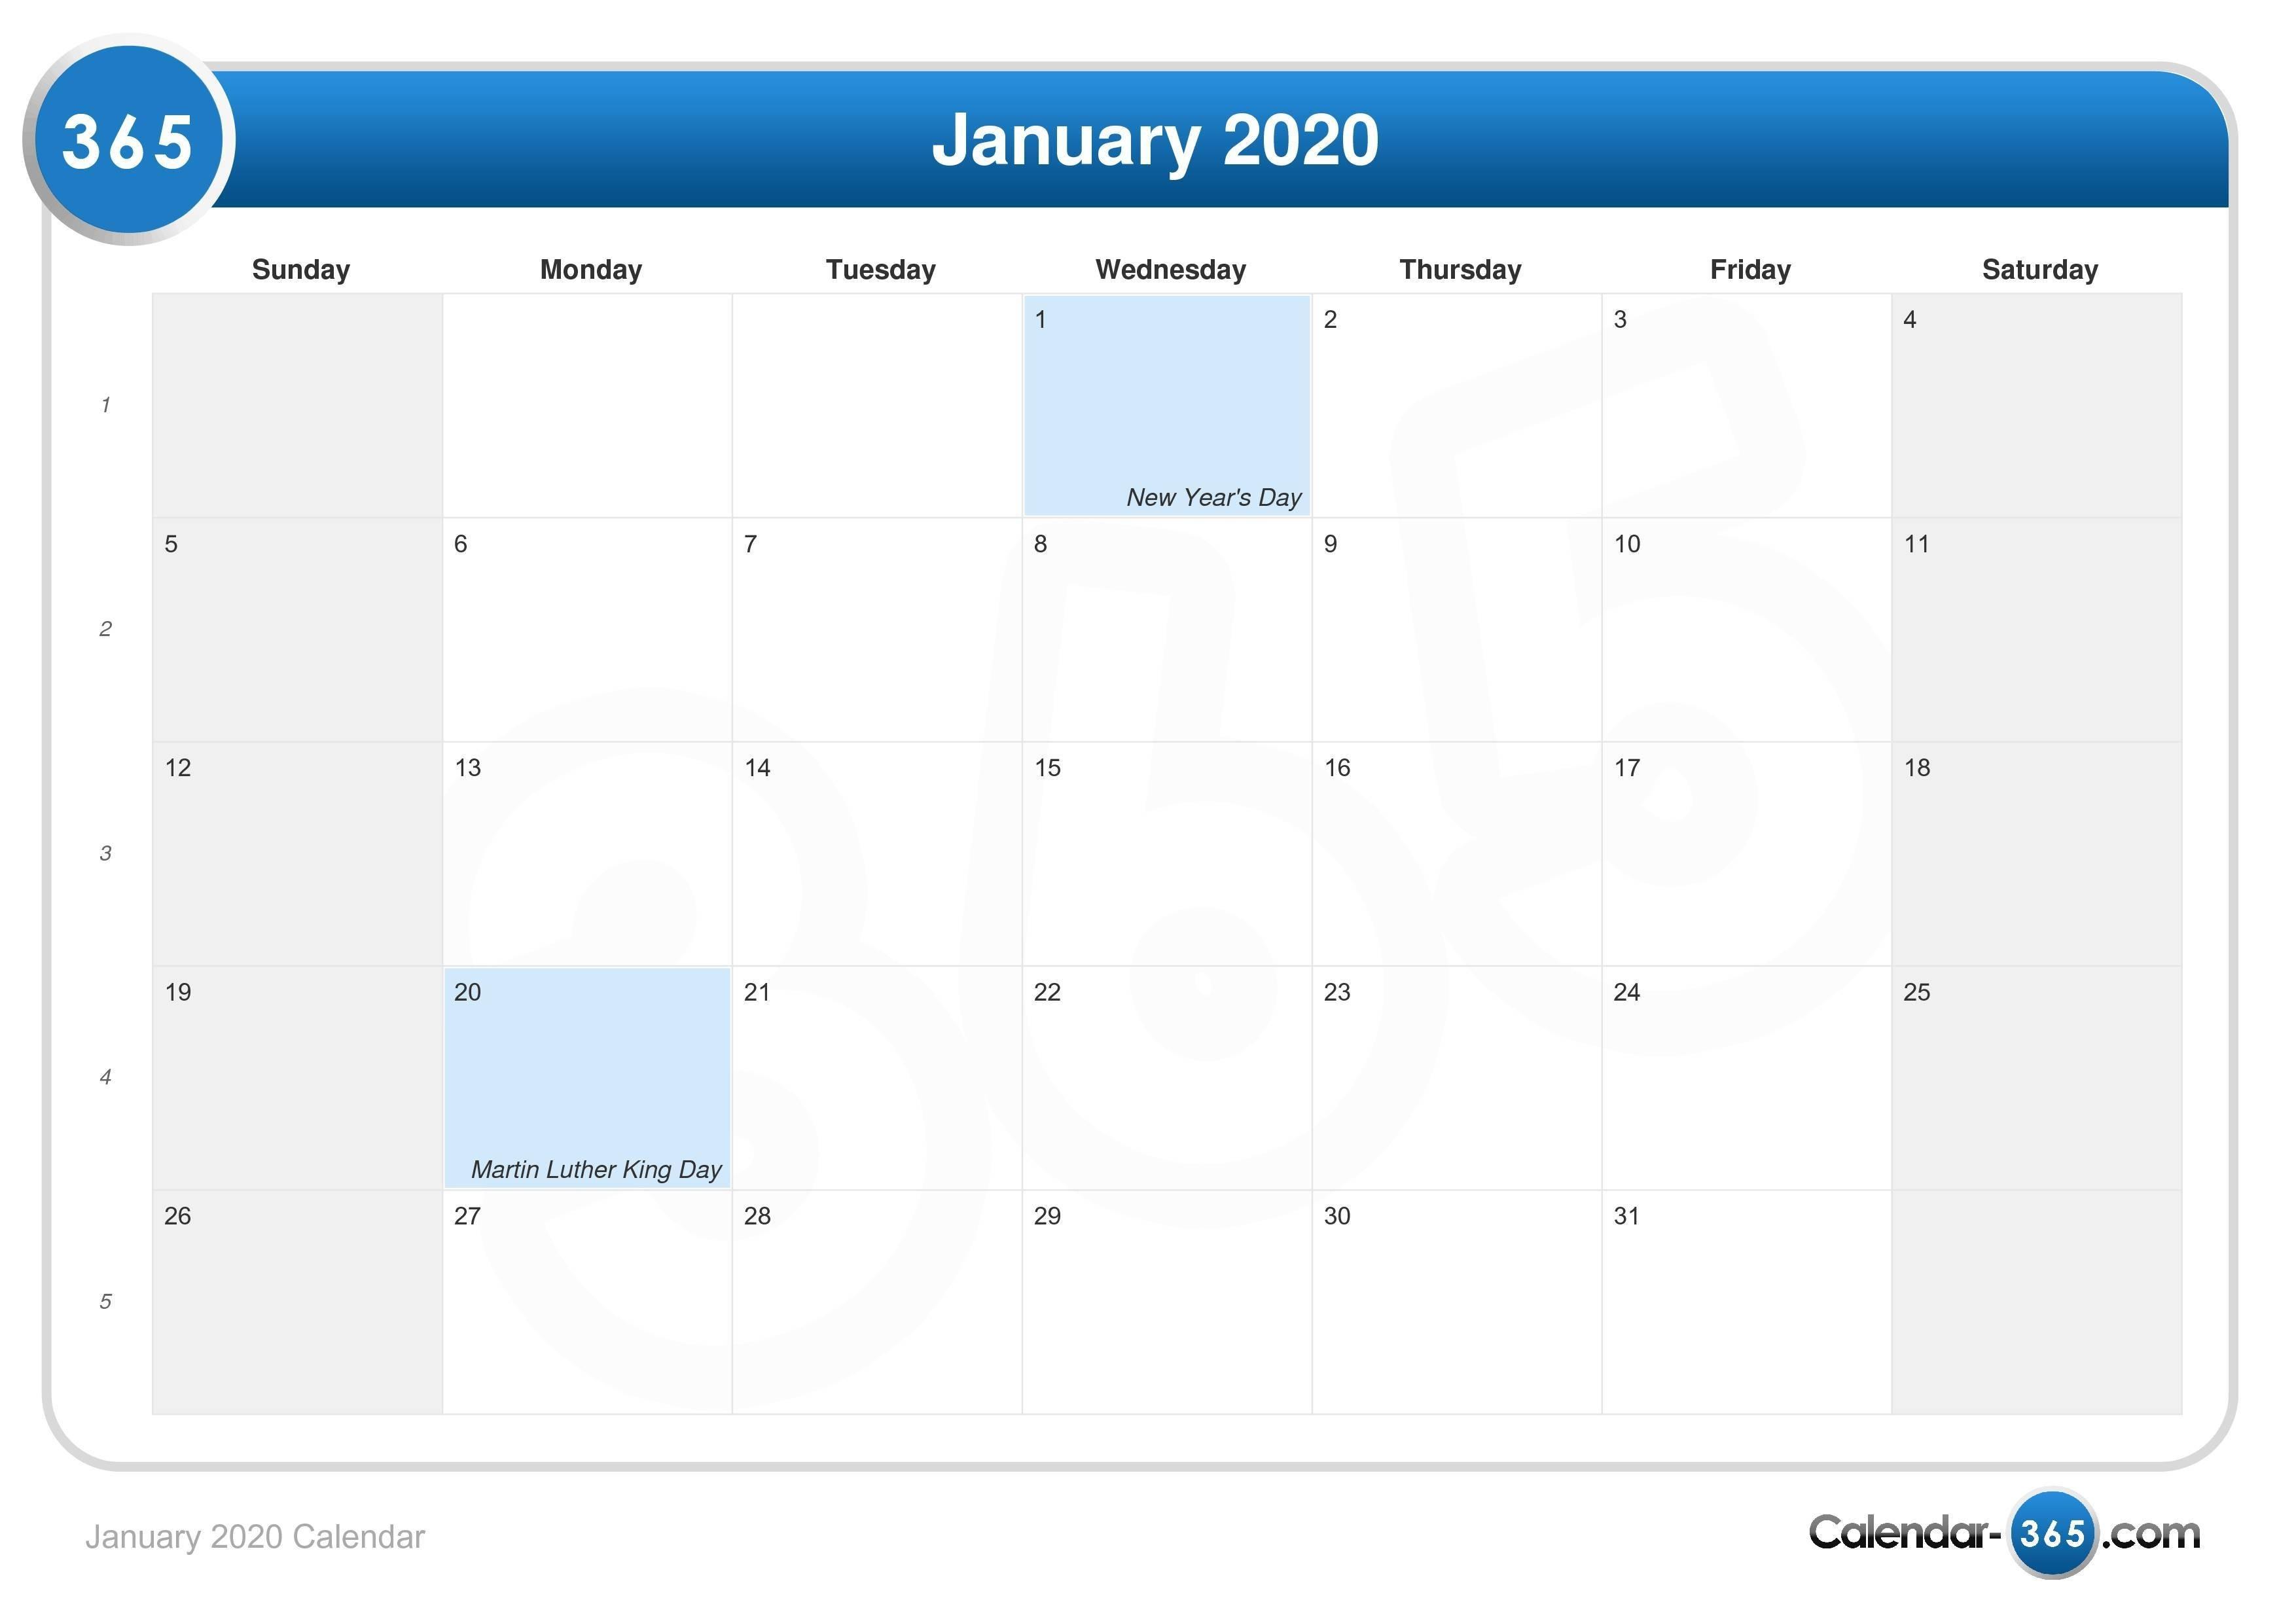 January 2020 Calendar-January 2020 Calendar Of Events